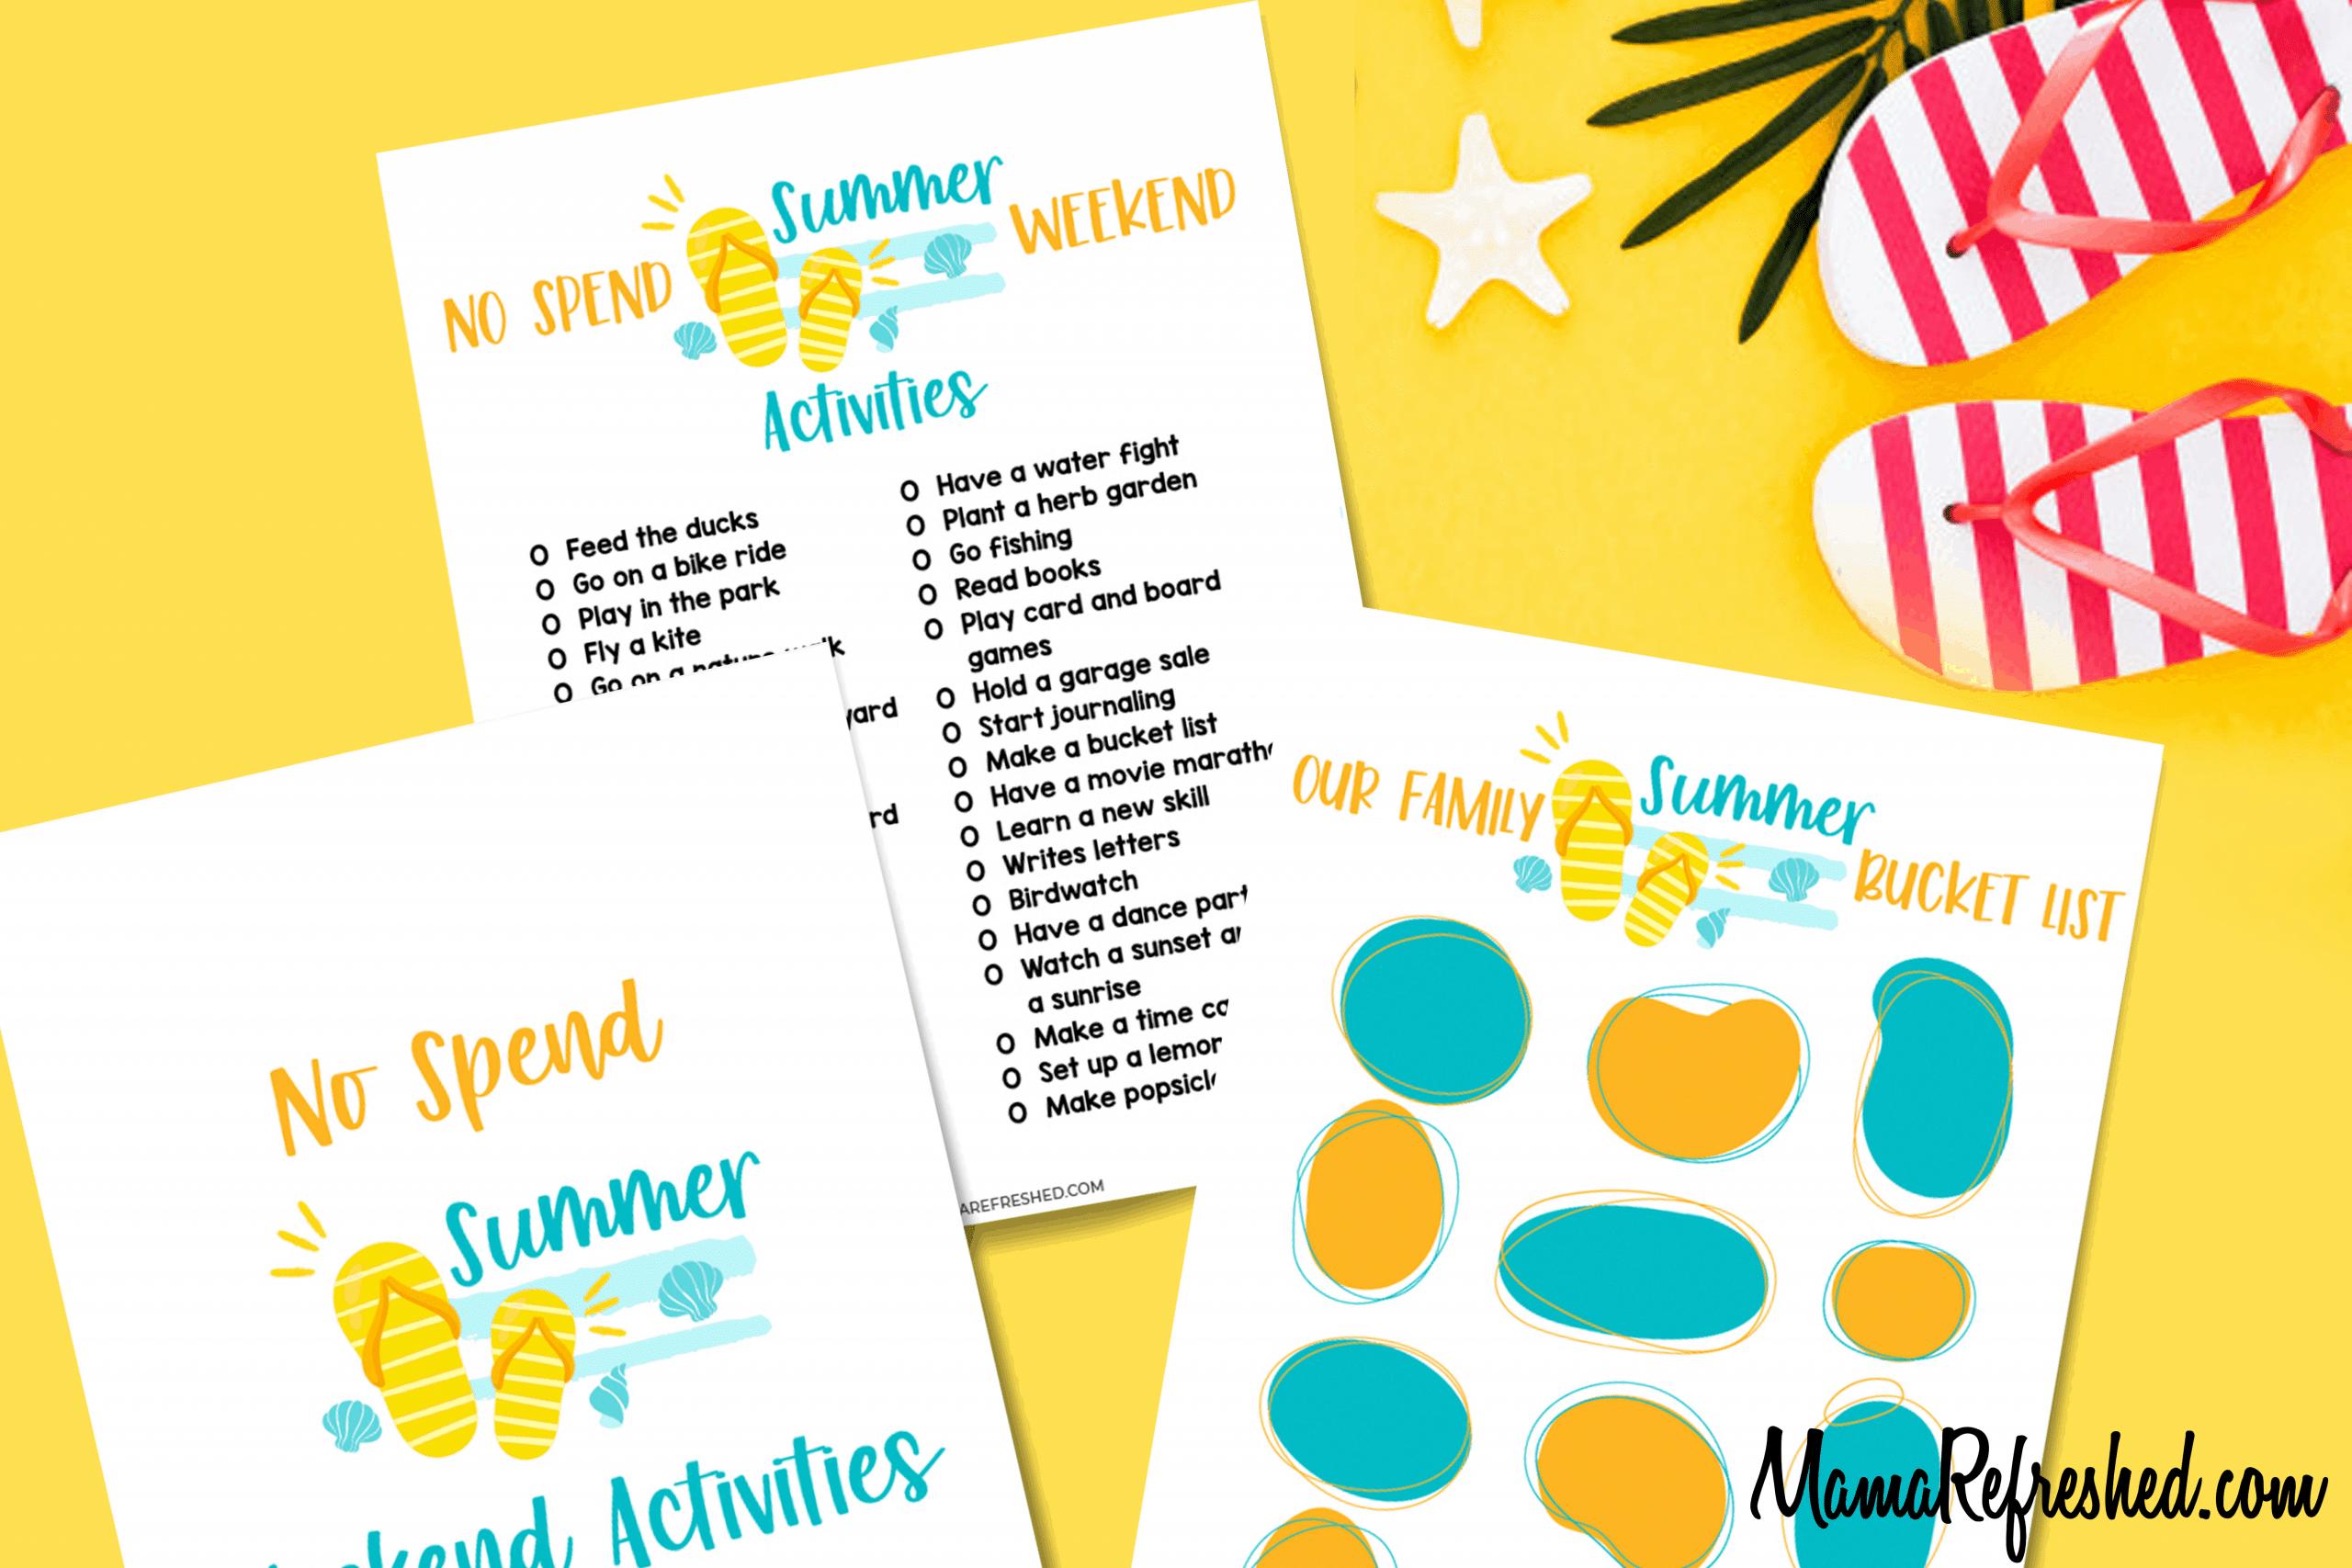 No Spend Summer Weekend and Bucket List